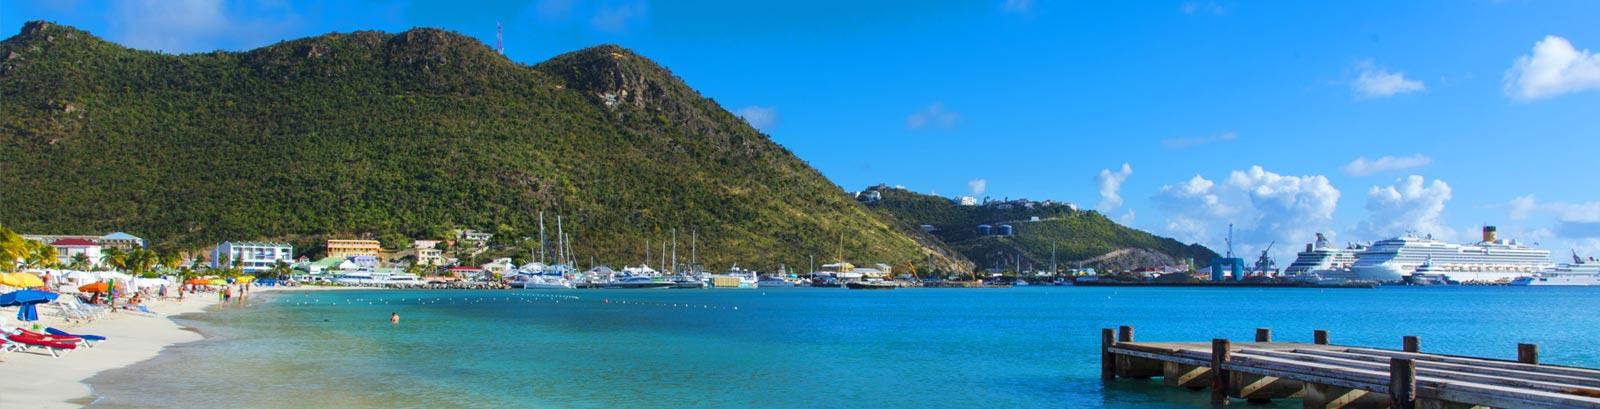 Ama Jewelers Transportation Tours - Nos recommandations au Simpson Bay Resort & Marina